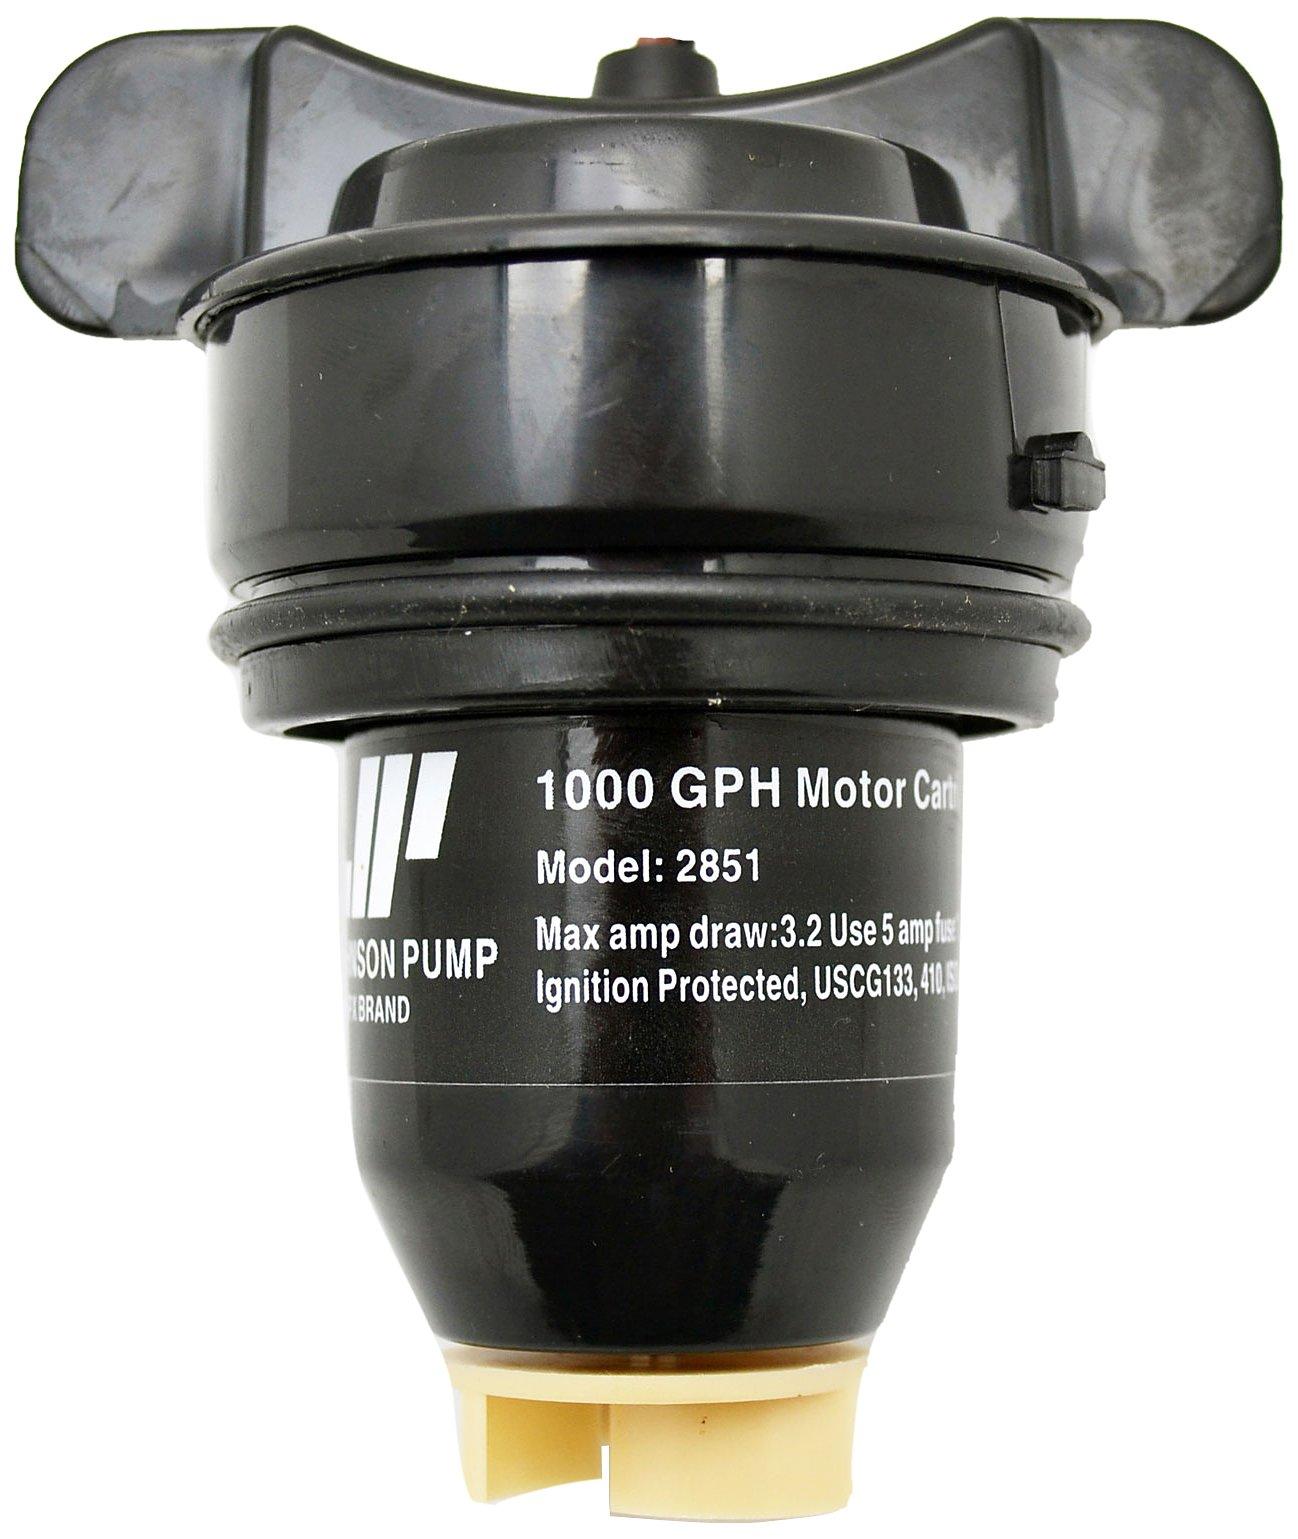 Johnson Pump of America 28512 Marine Pump Cartridge for 1000 GPH Motor by Johnson Pump